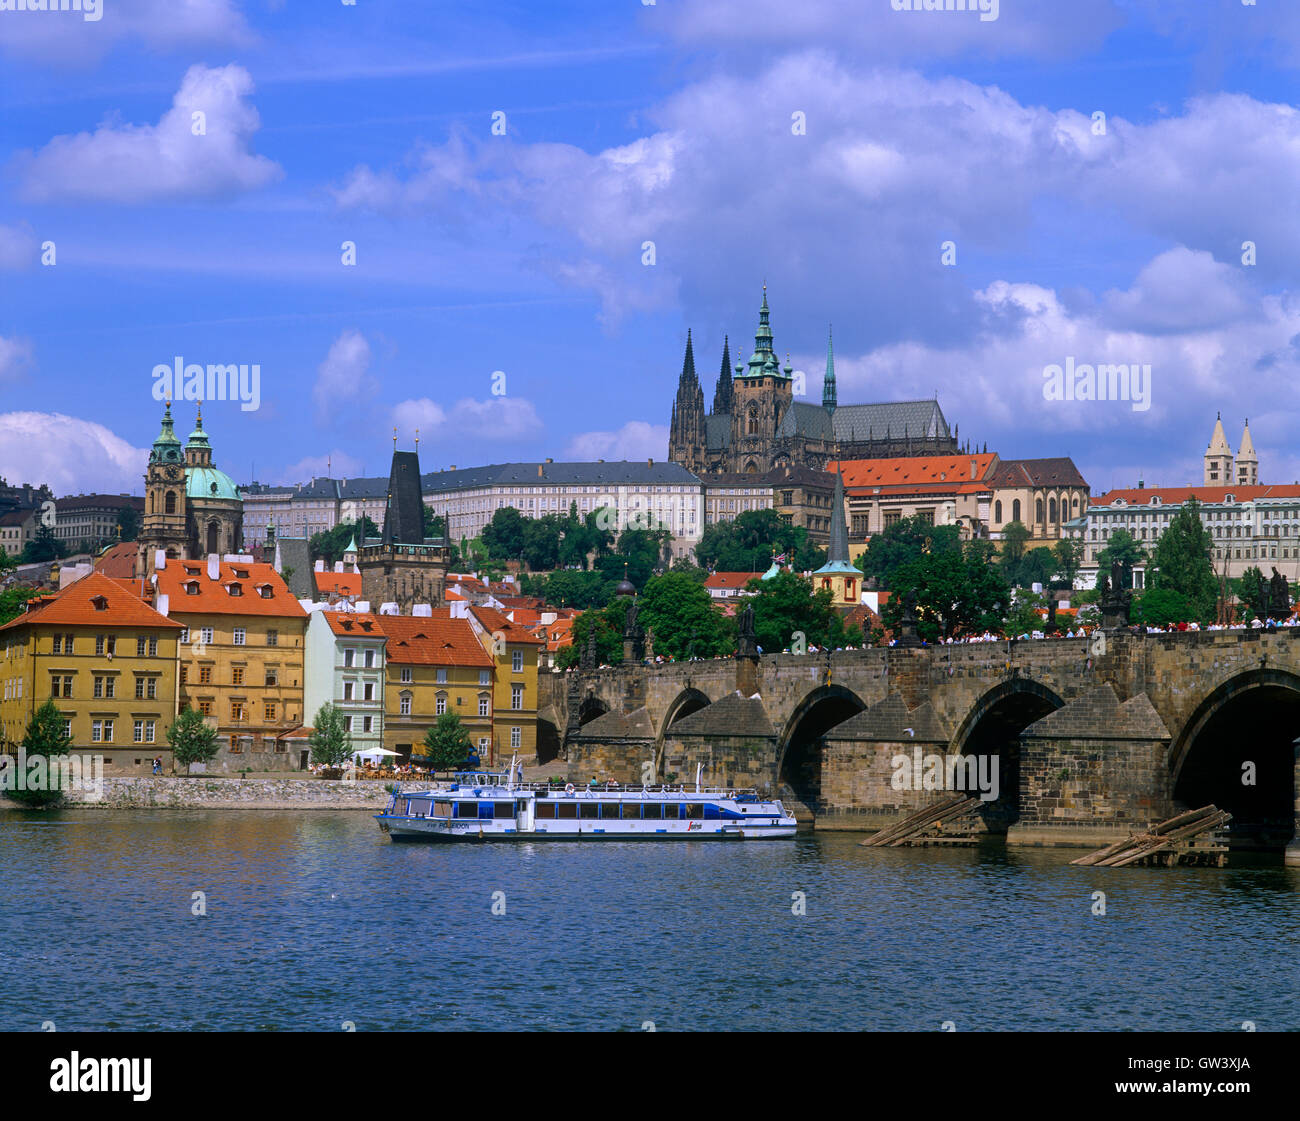 Charles Bridge and sightseeing boat on River Vltava, Stare Mesto, Prague, Czech Republic - Stock Image